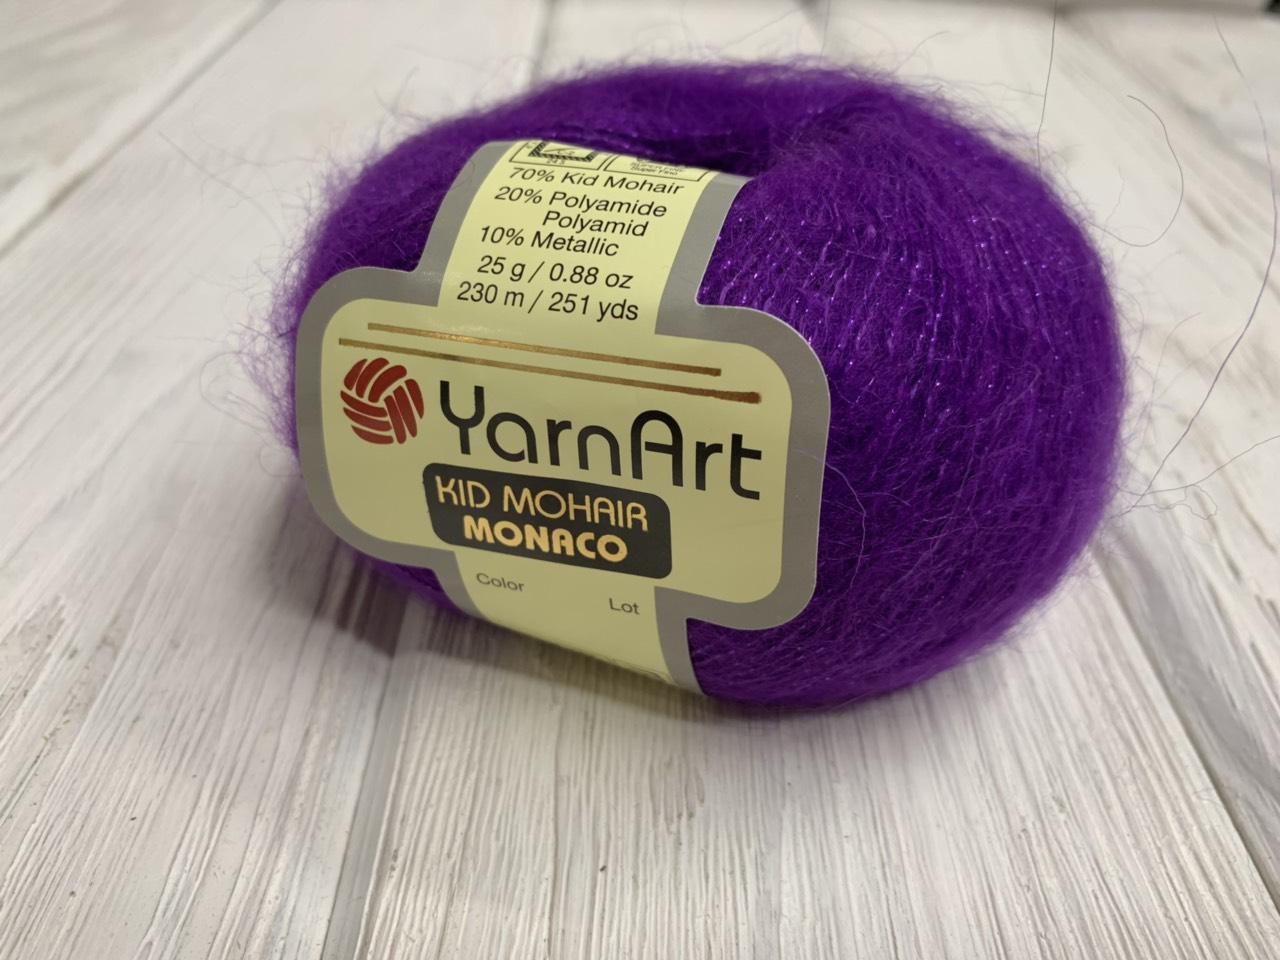 YarnArt Kid mohair Monako (ЯрнАрт Кид мохер Монако) 23 - фиолетовый купить с доставкой в Беларуси